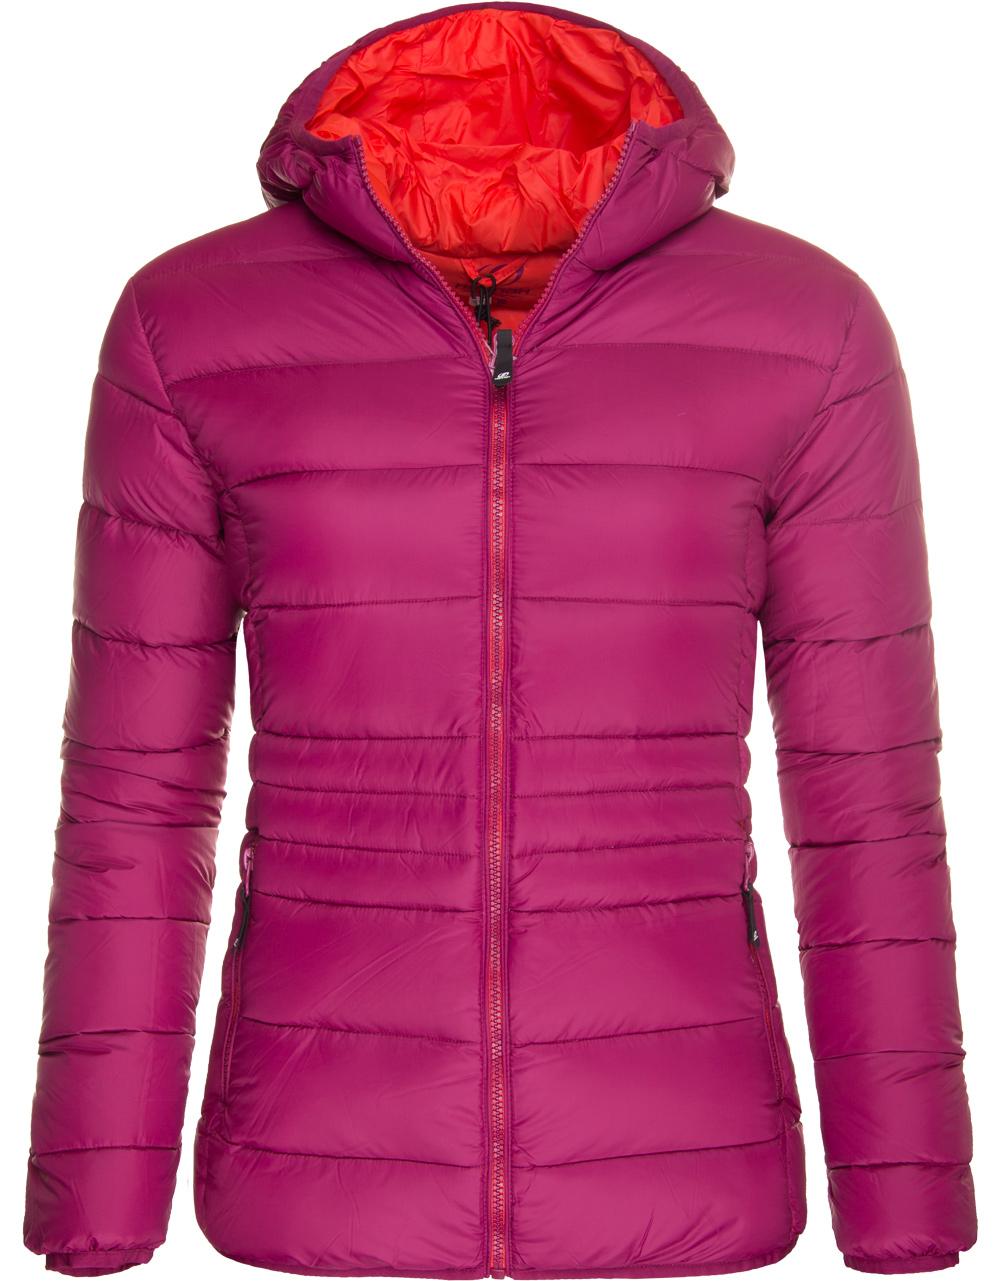 Zimní péřová bunda dámská HANNAH Betlis II